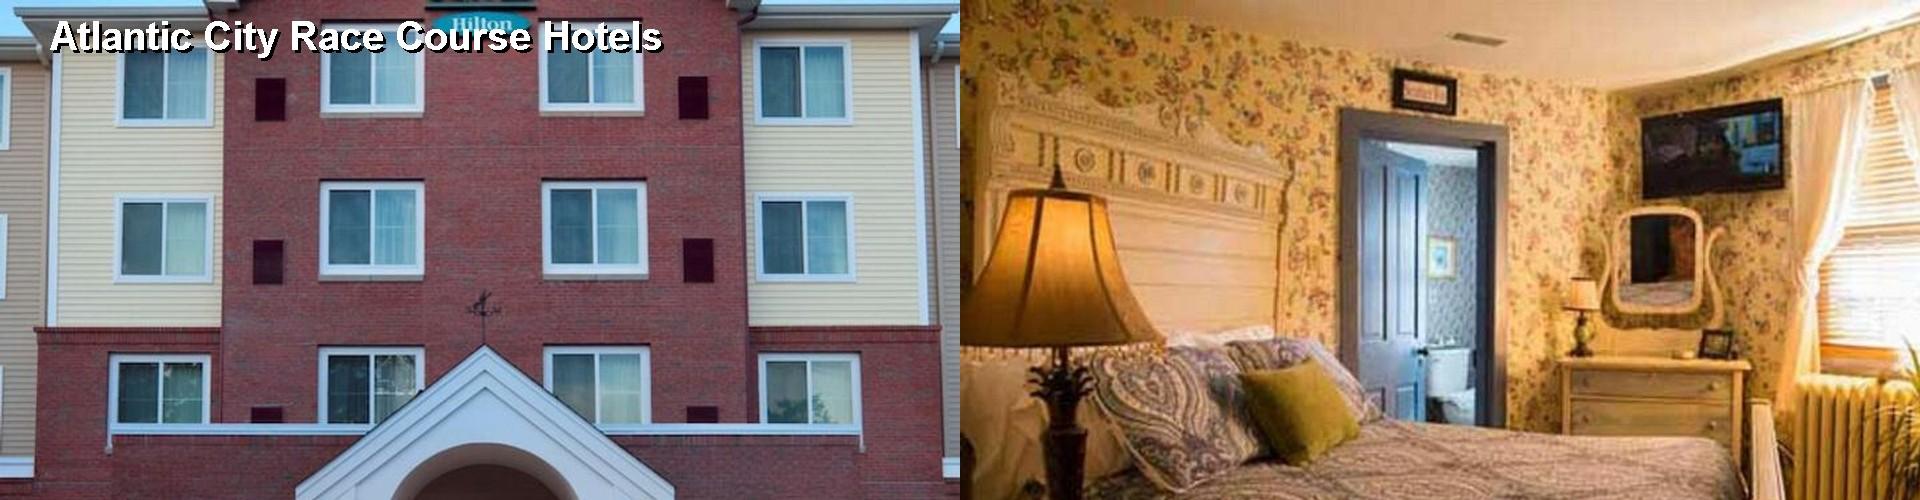 3 Best Hotels Near Atlantic City Race Course